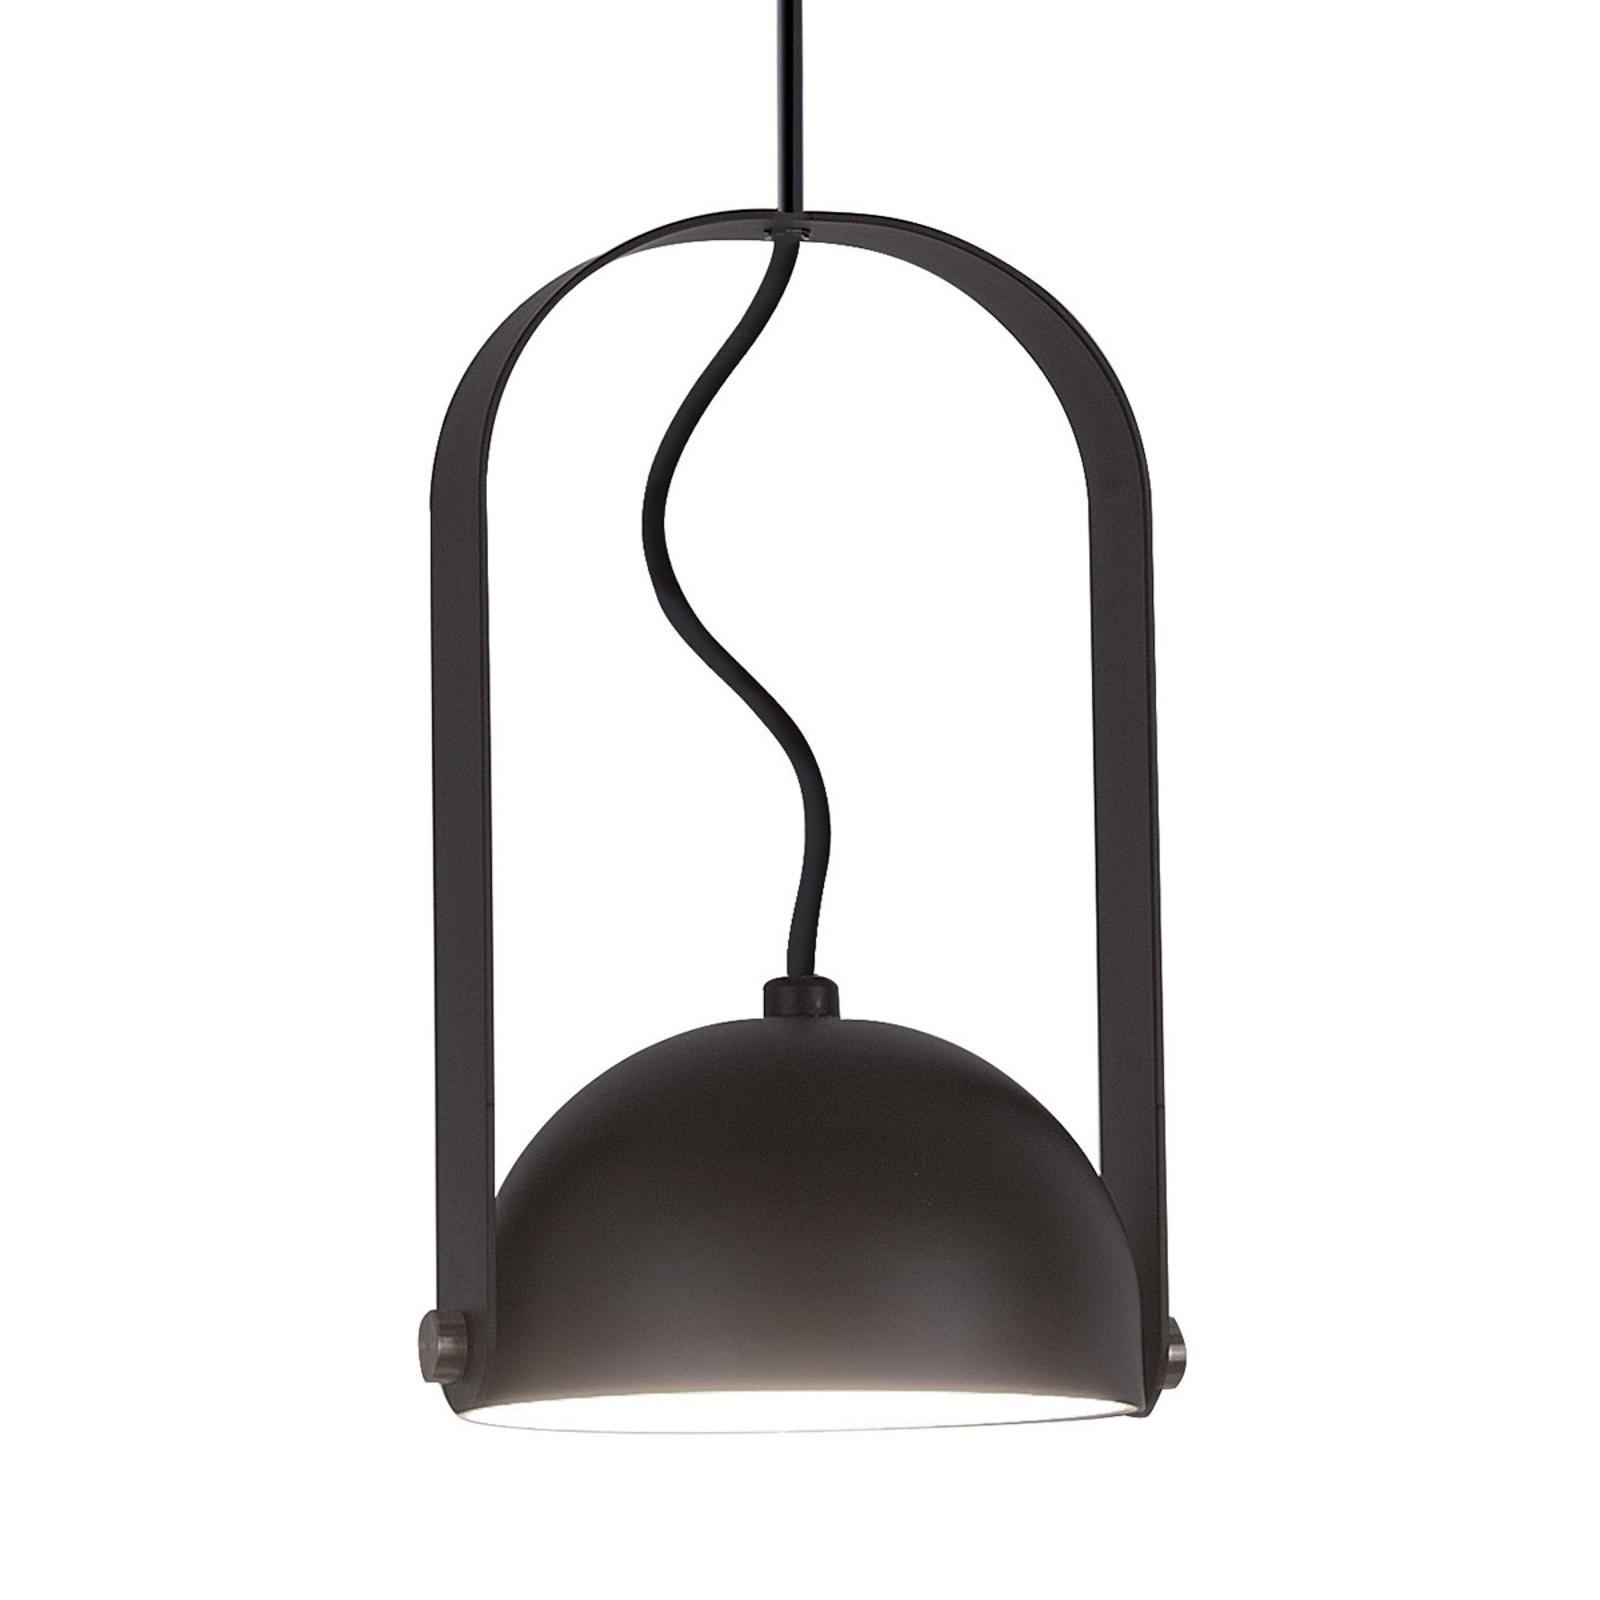 LED hanglamp Hemi draaibare kap zwart